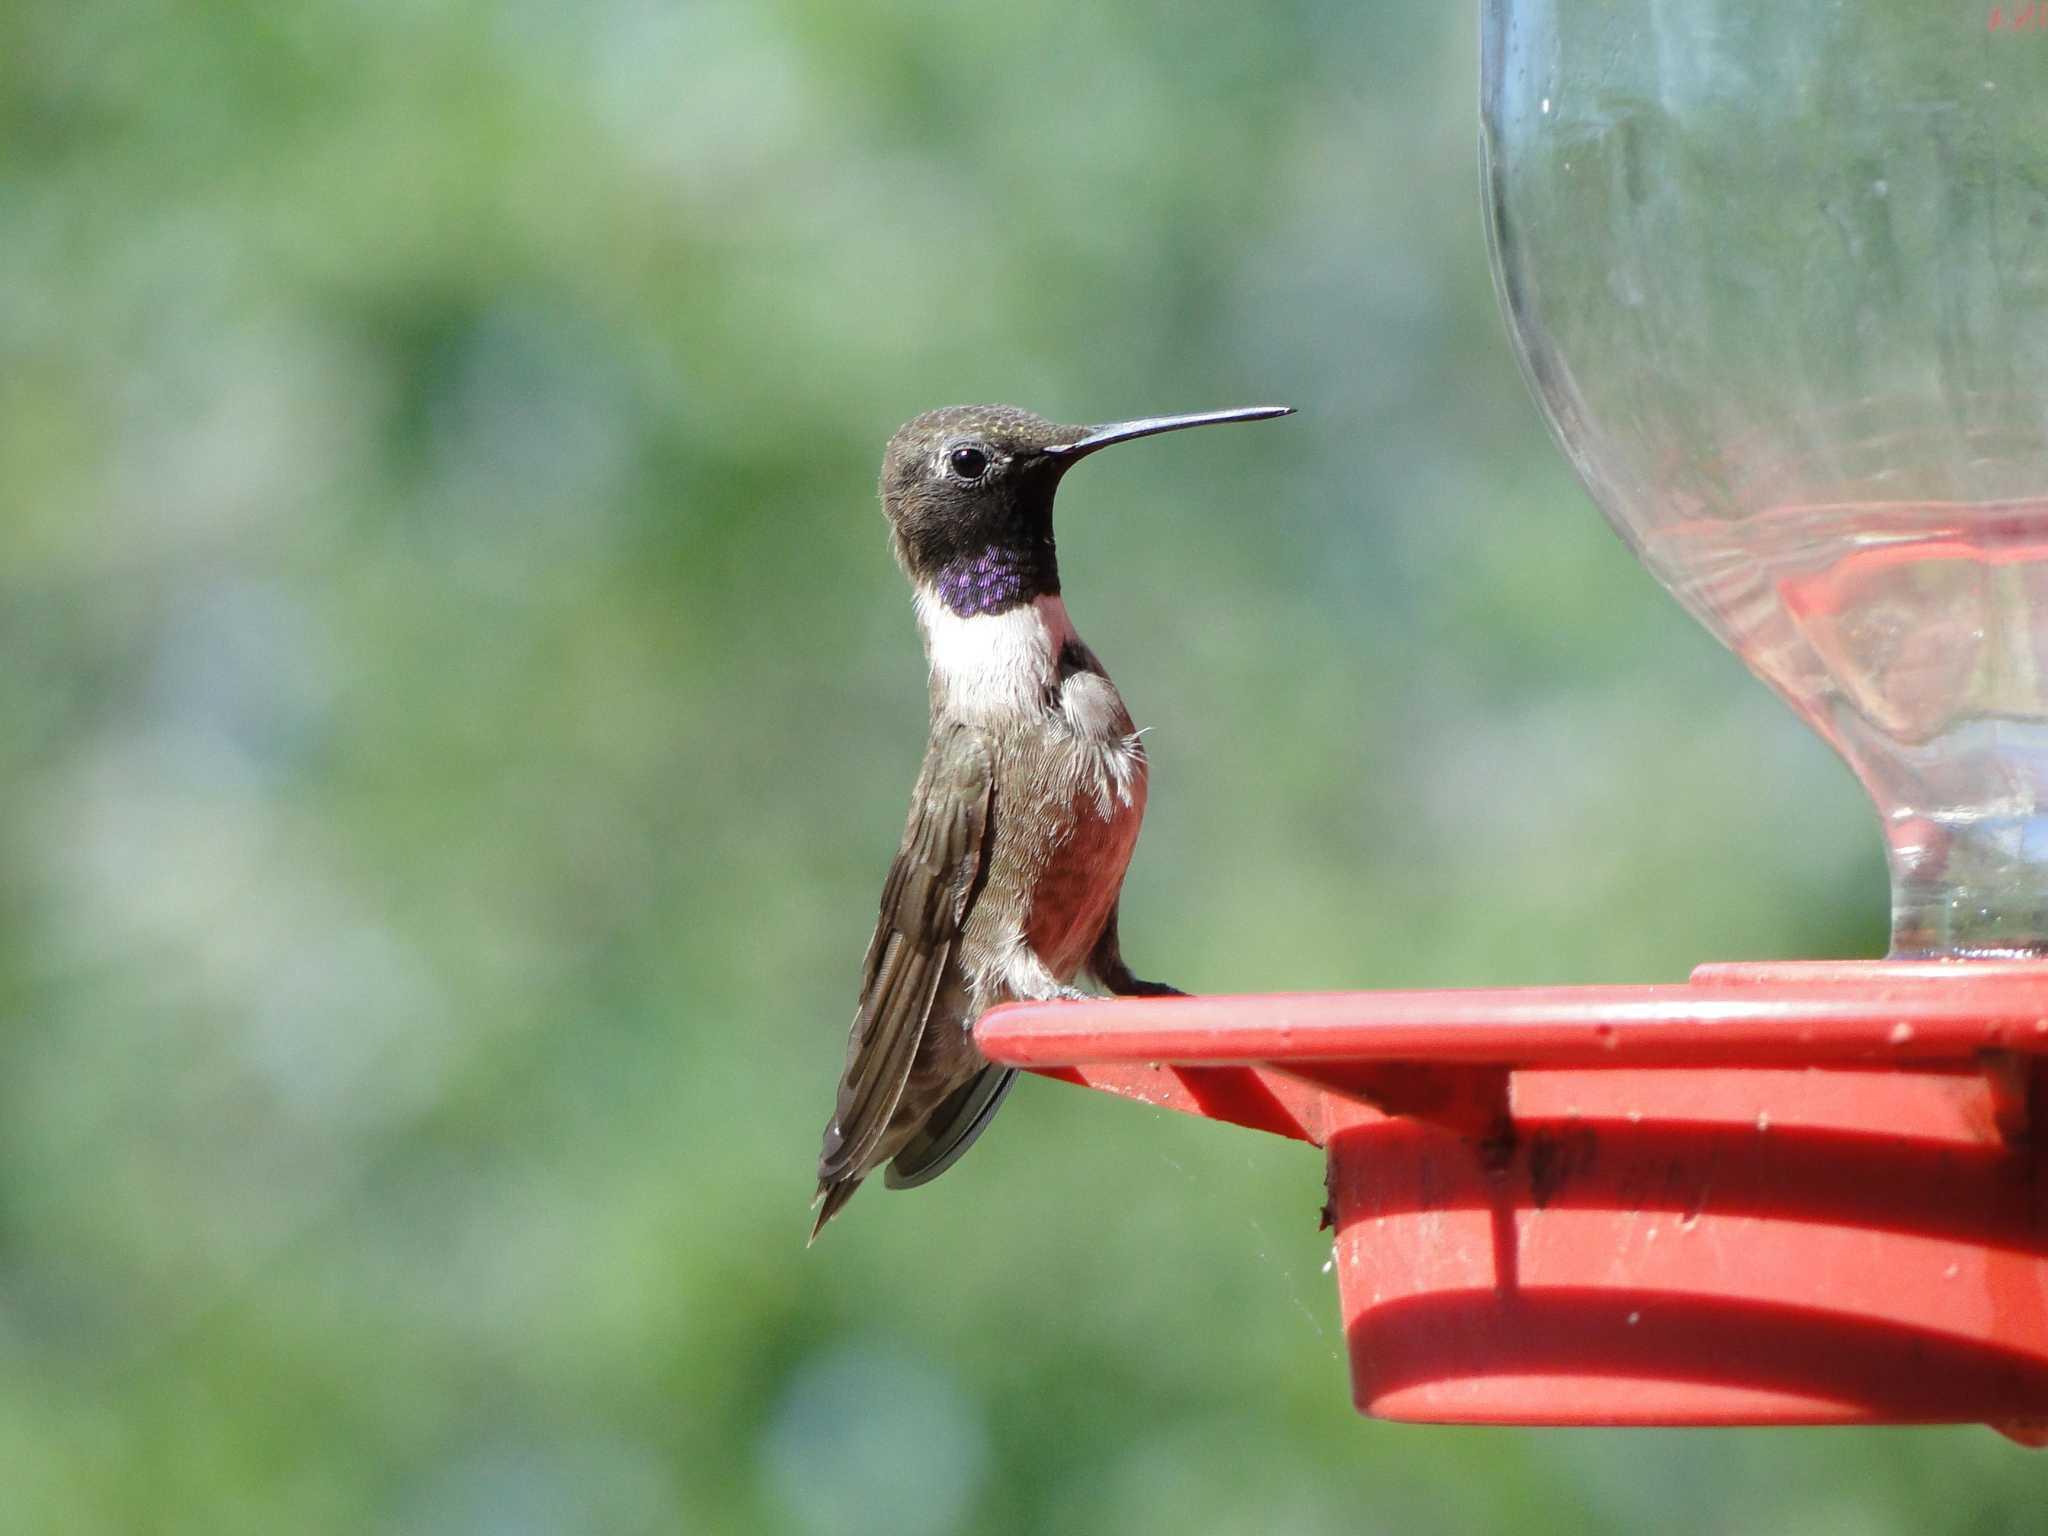 birdfeeder craft homemade glue milk paint and feeder jug sticks one carton bird gallon pin green hummingbird backyard